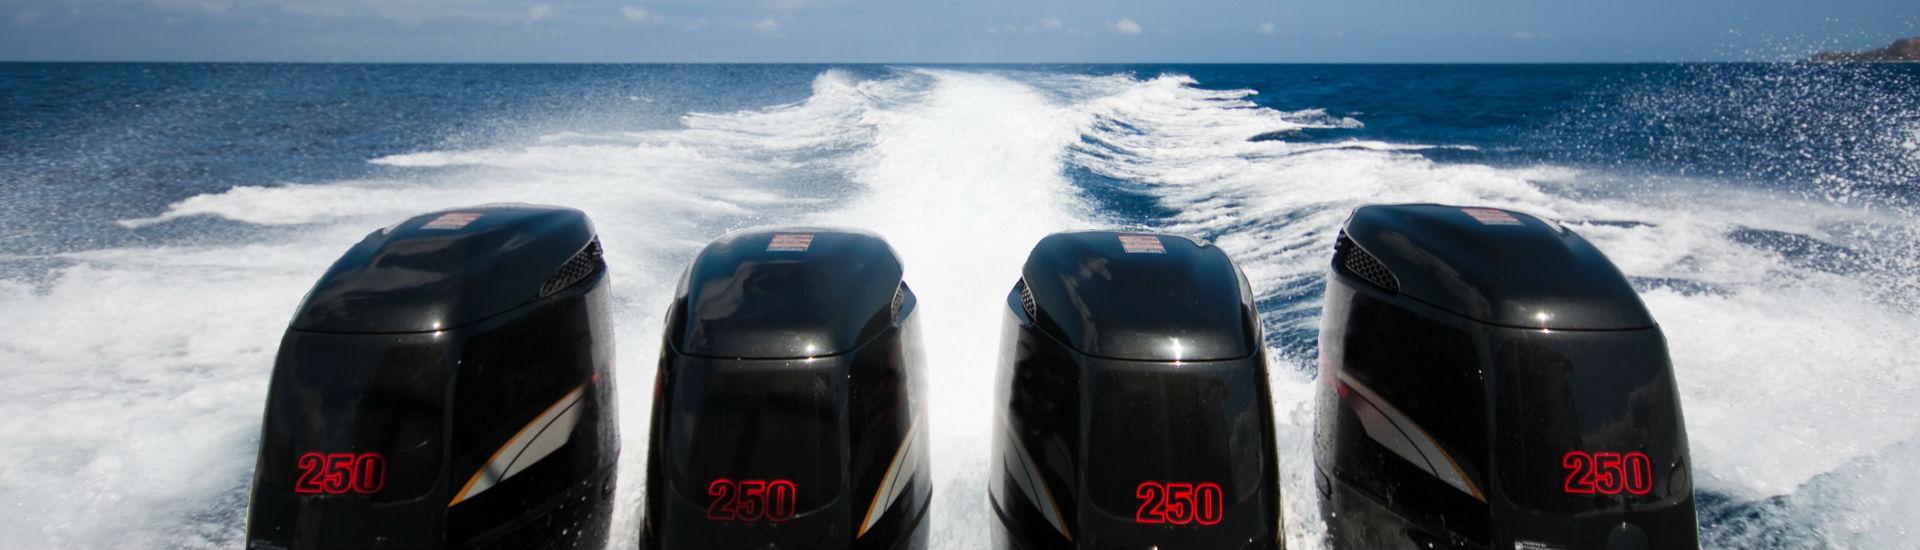 Yamaha Marine Outboard Wiring Diagram 4 Yamaha Outboard Digital